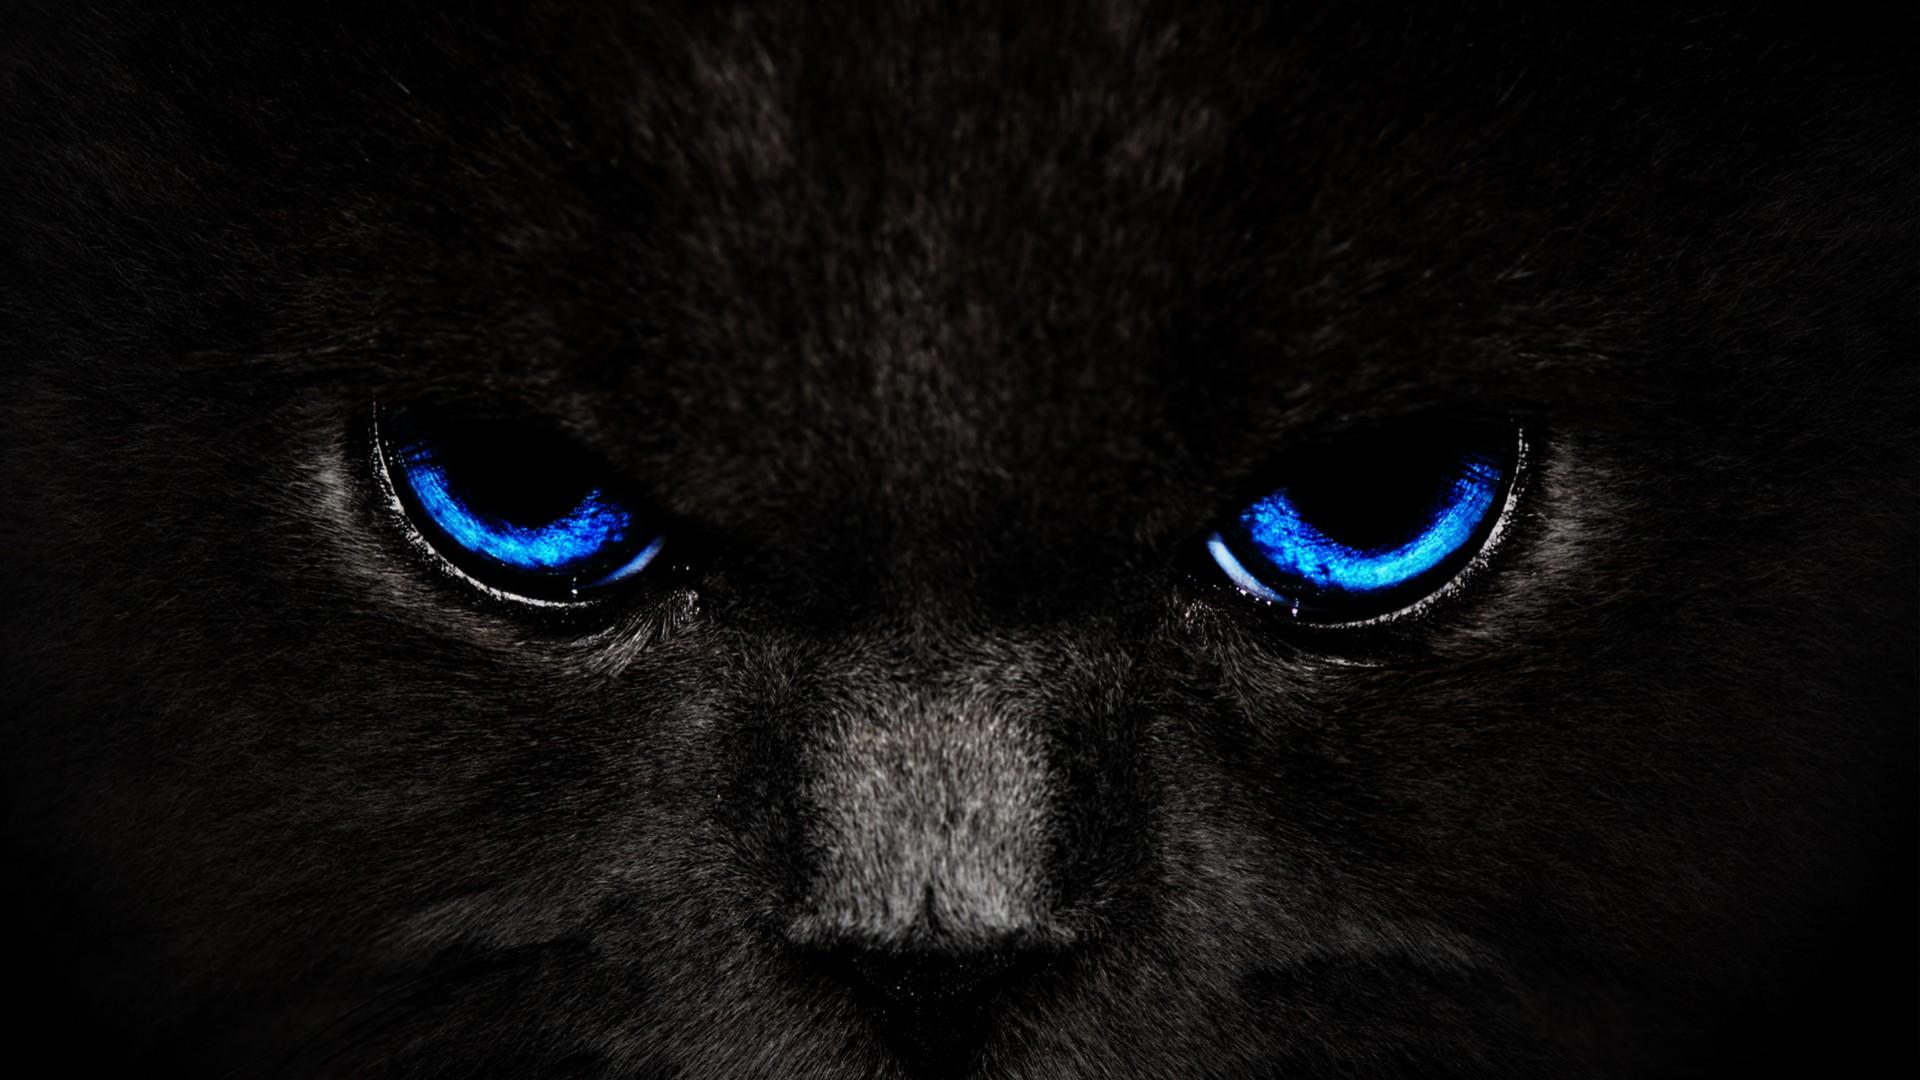 Black Cat Blue Eyes High Quality WallpapersWallpaper DesktopHigh 1920x1080